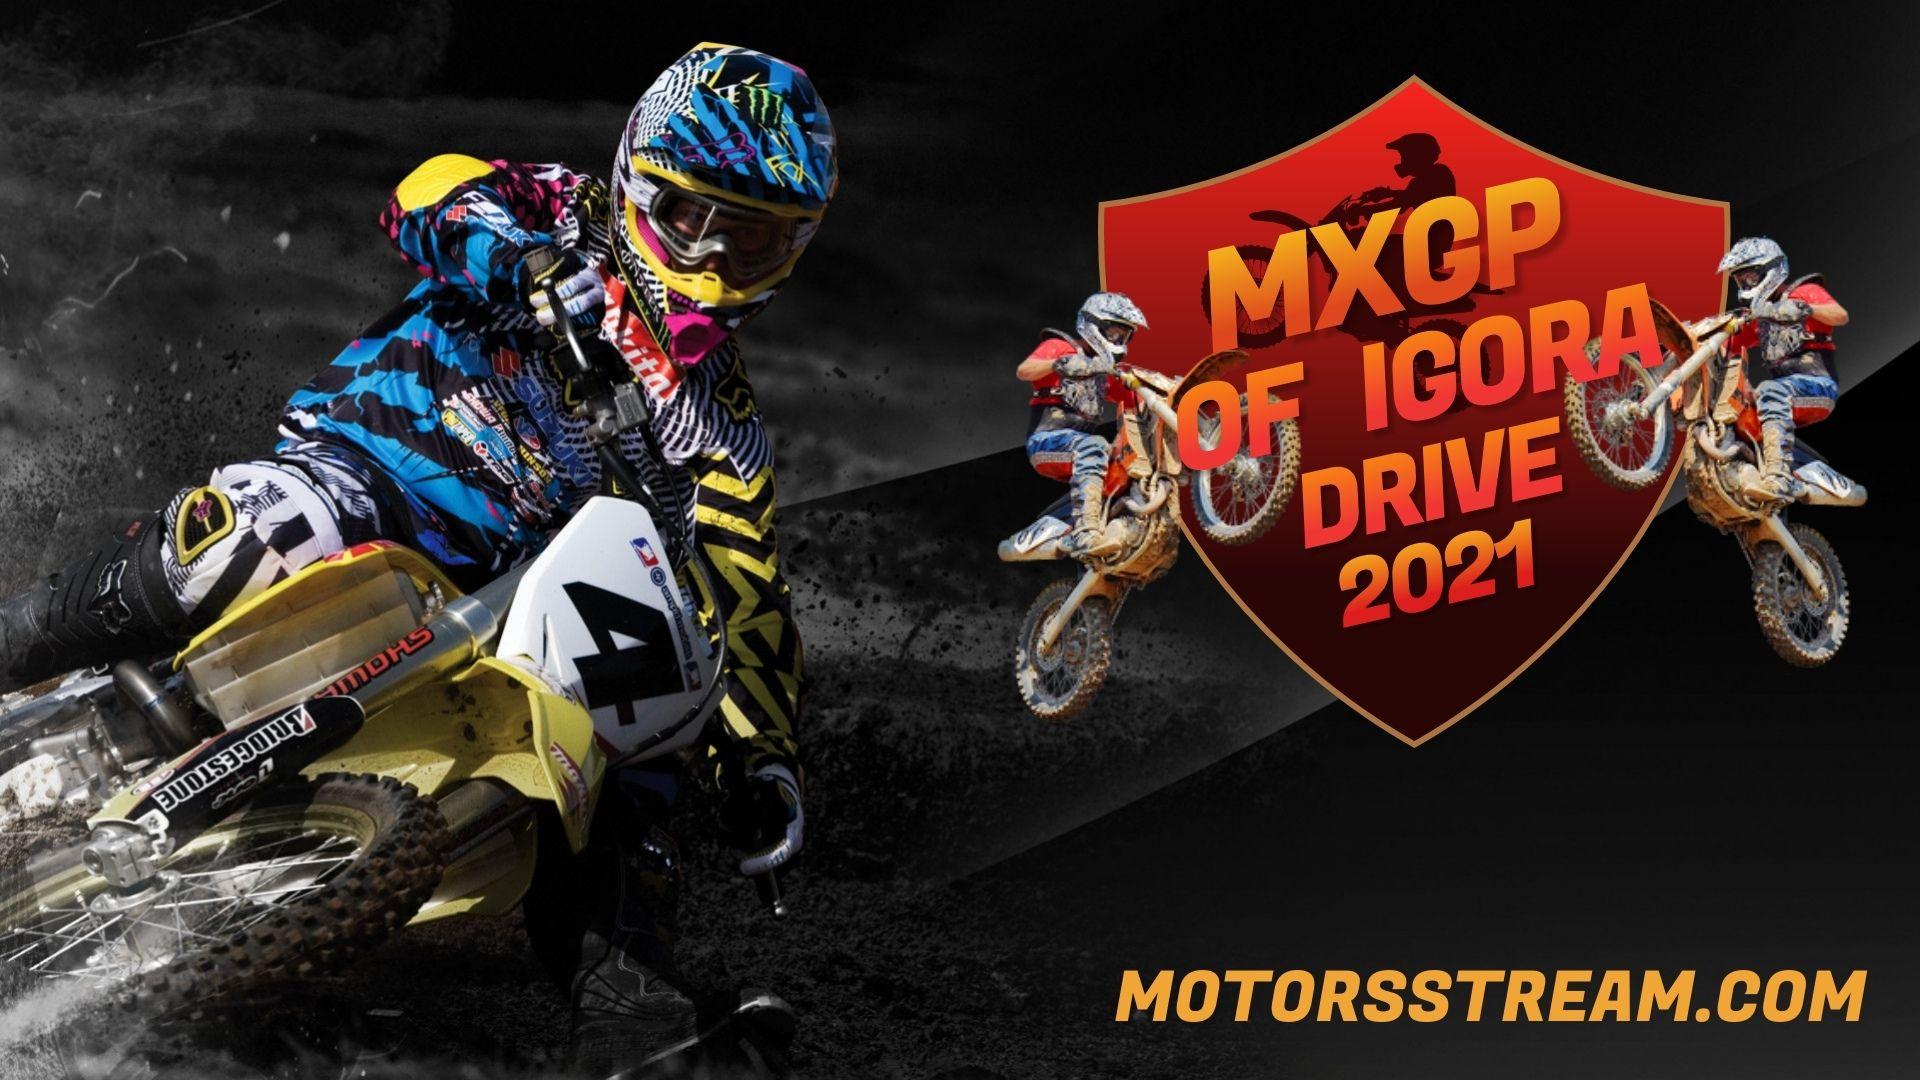 FIM Motocross WC Igora Drive Live Stream 2021 | MXGP